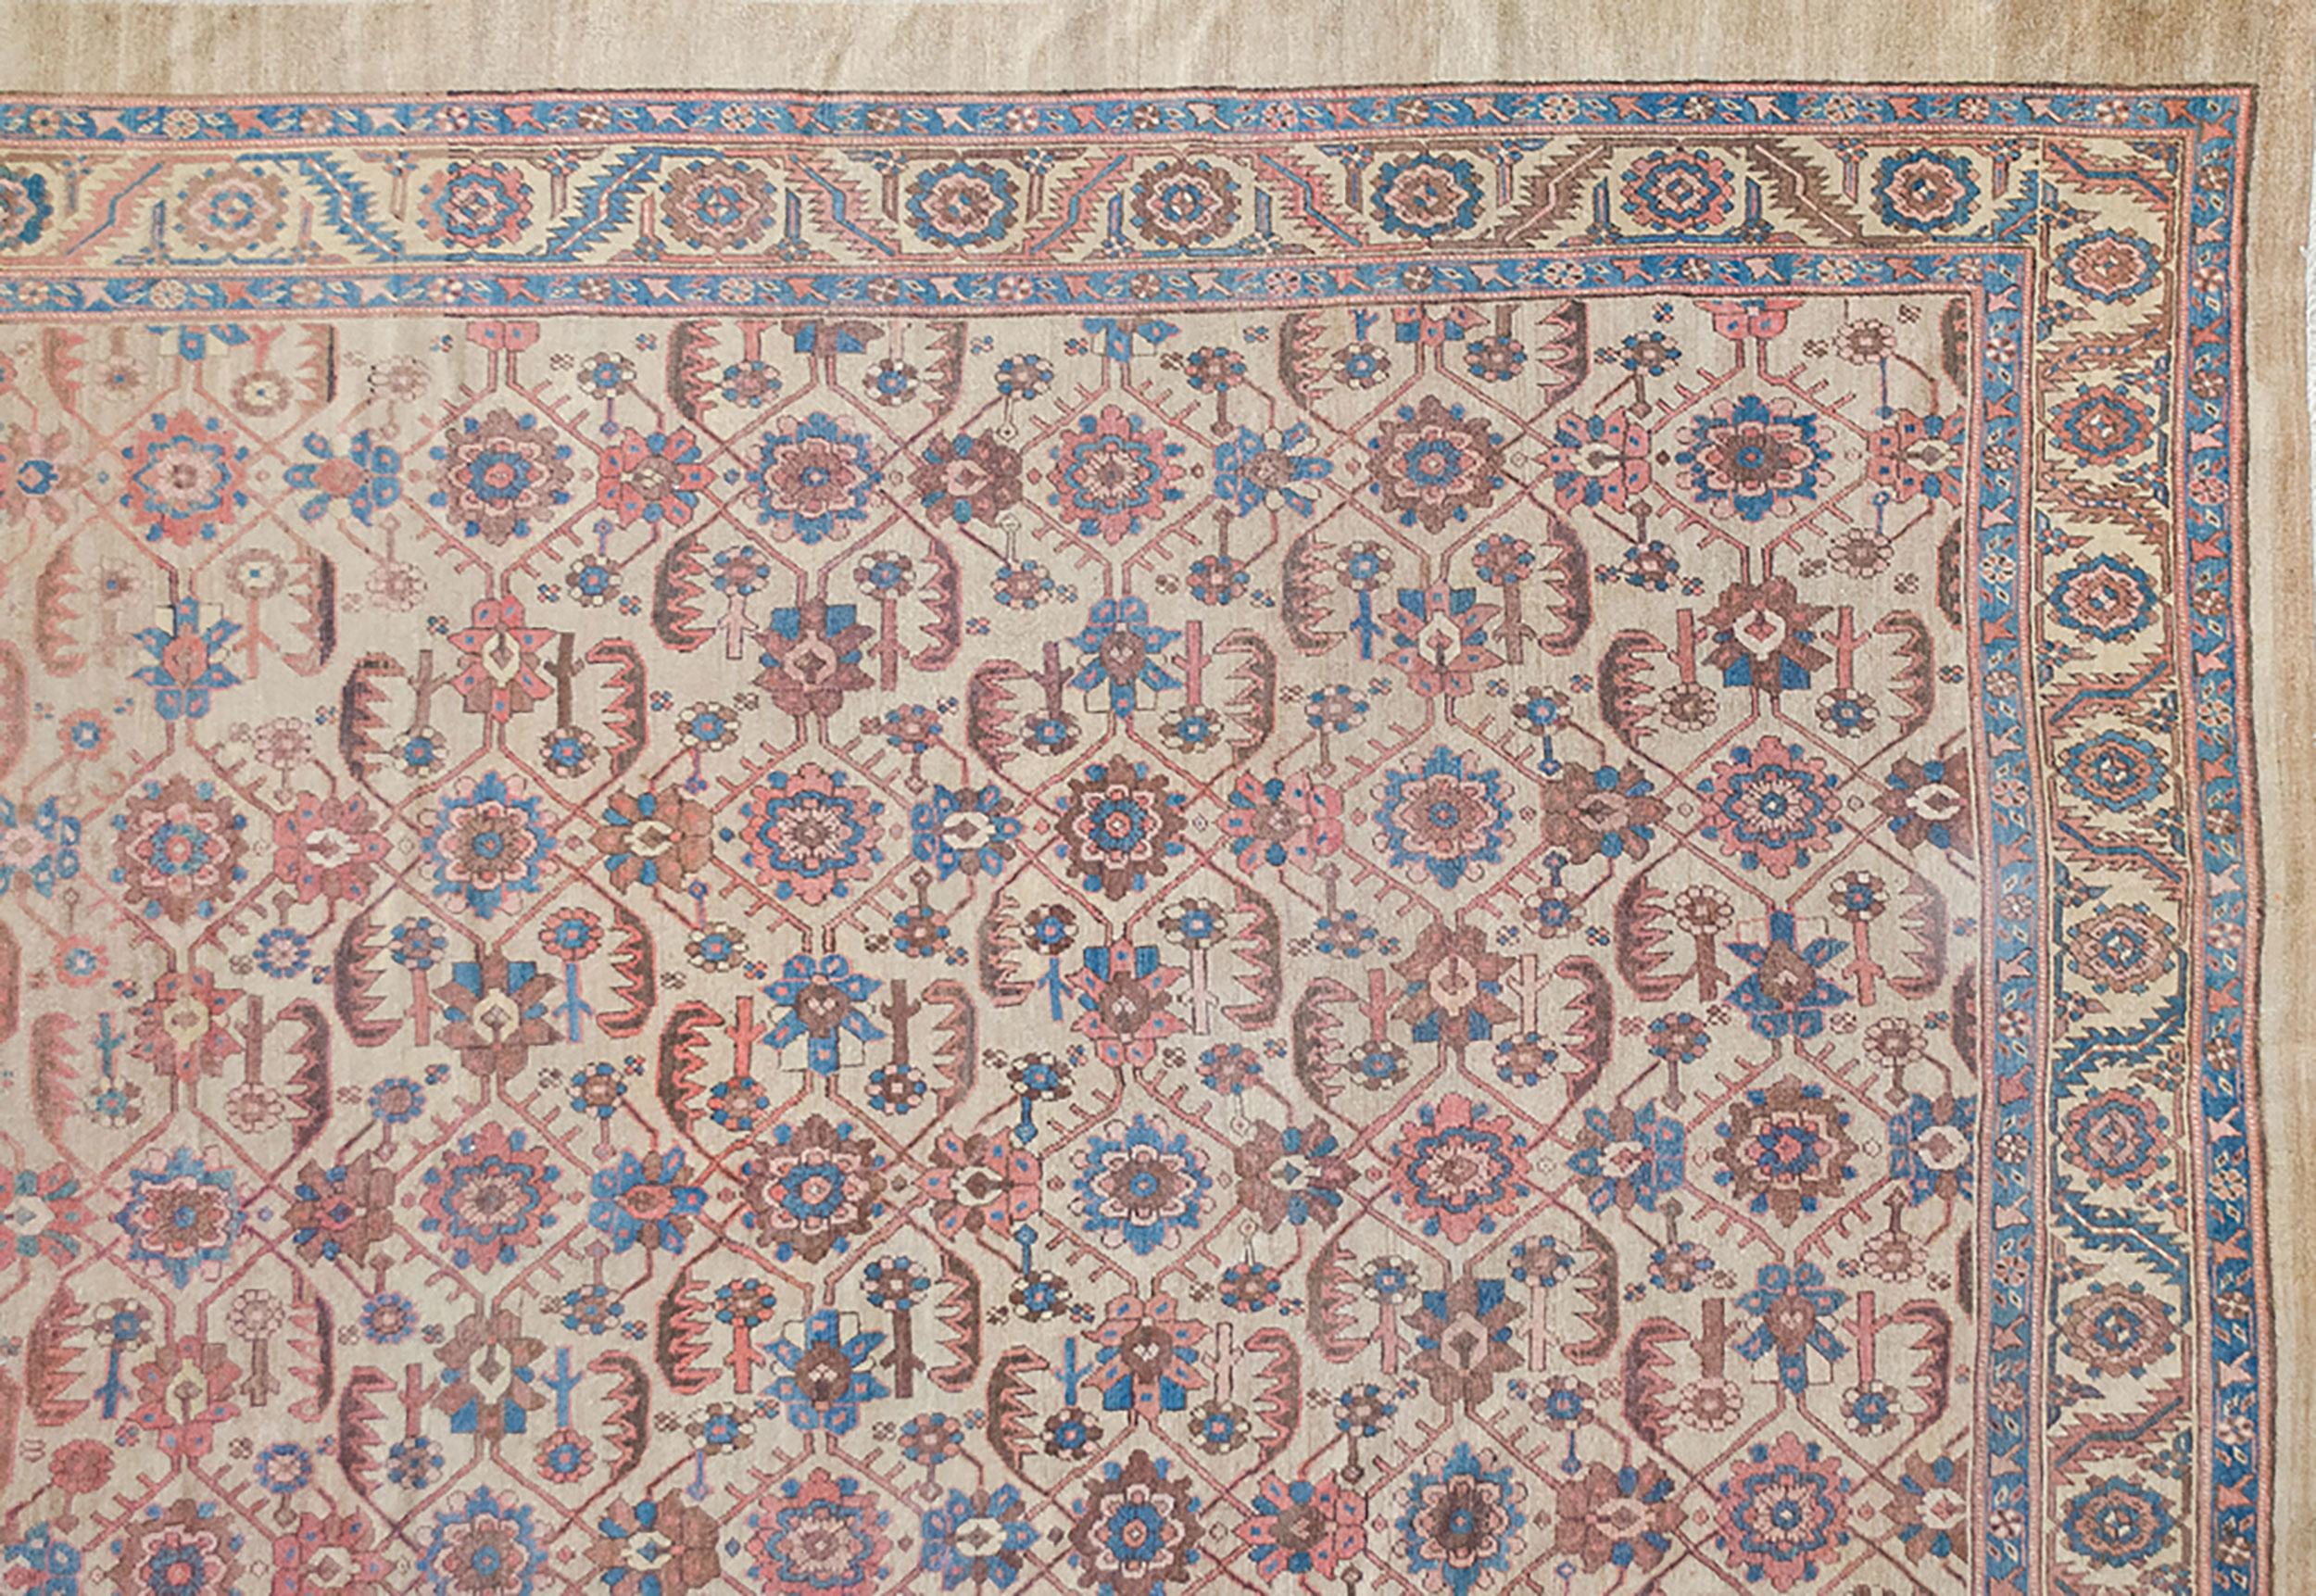 Antique Bakhshaysh Carpet 352x300cm